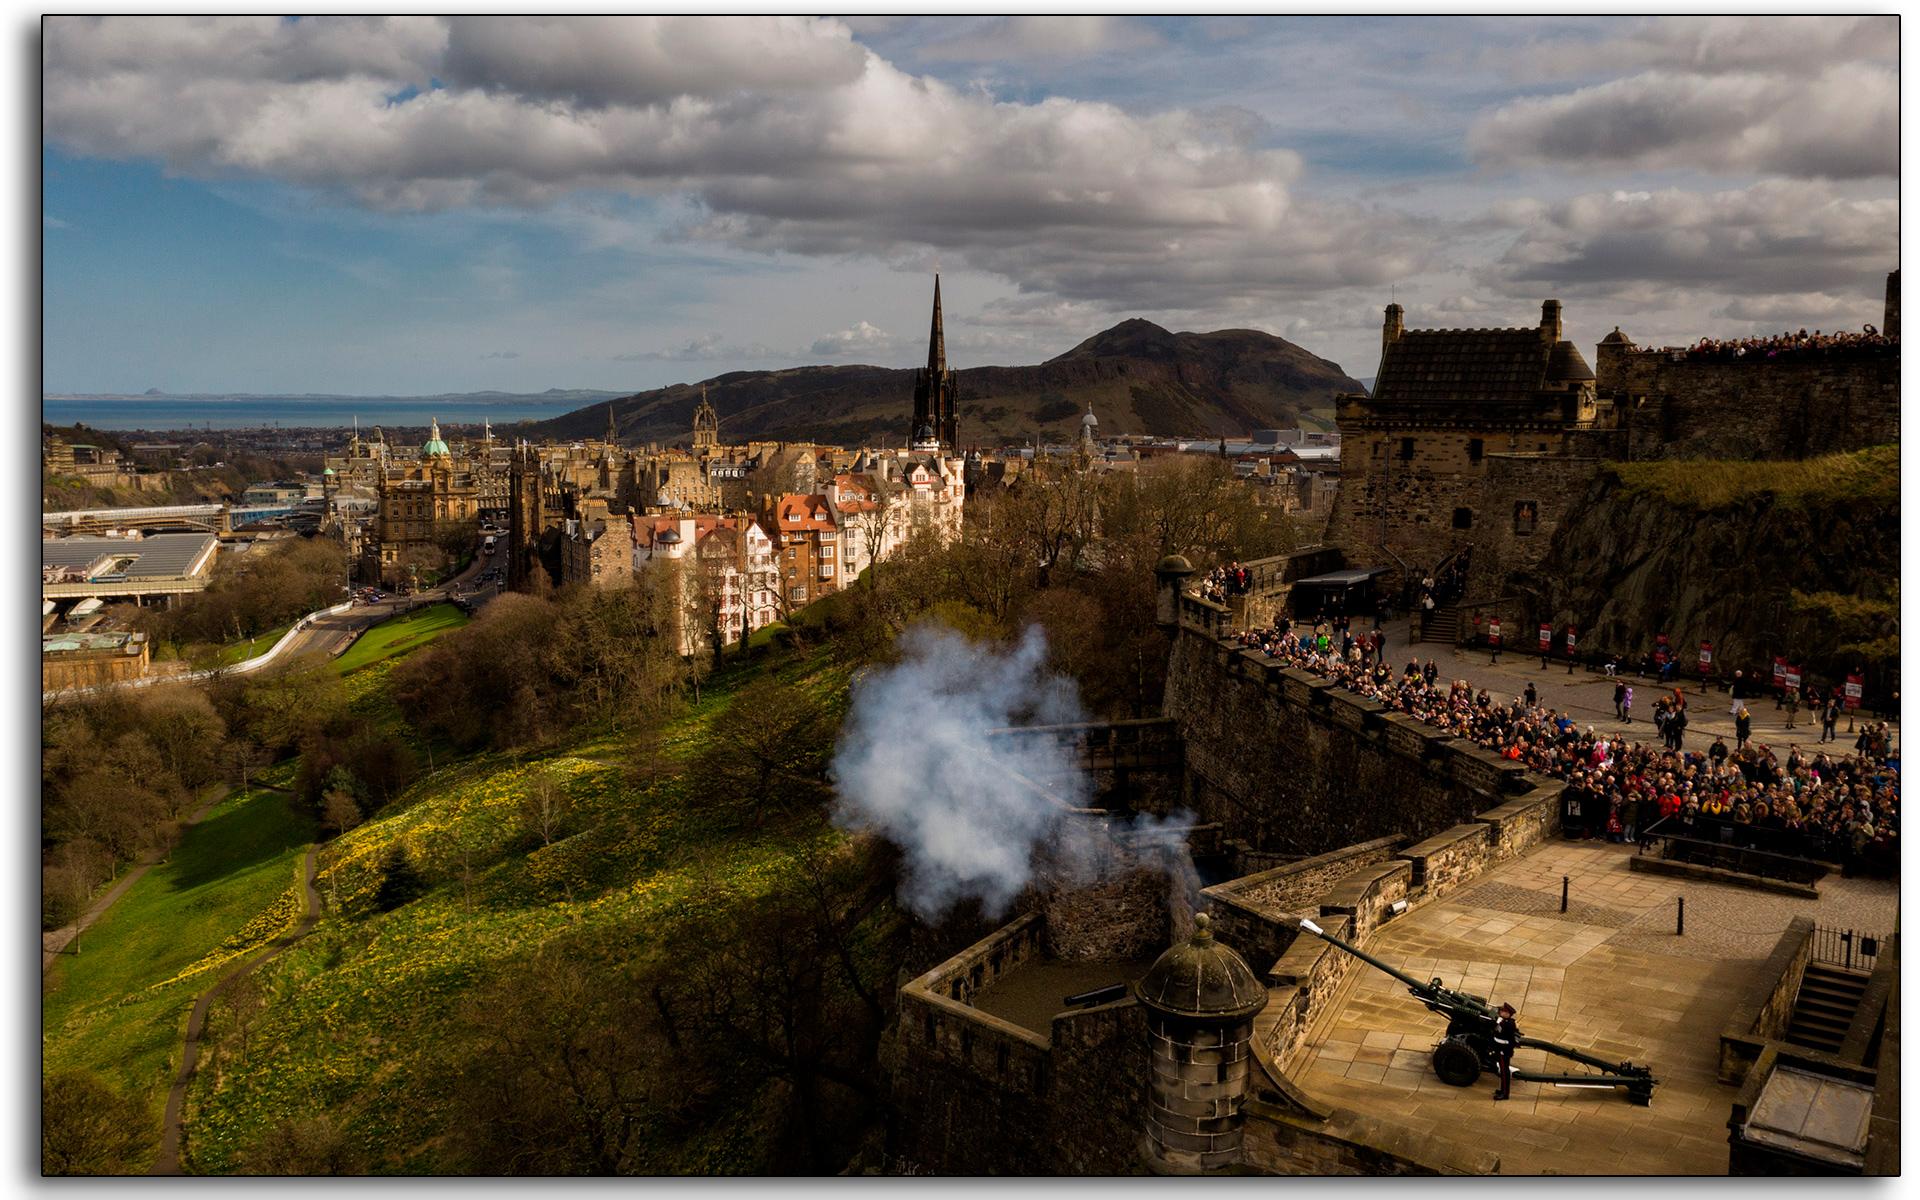 Edinburgh Castle, one o'clock, gun, artillary, royal, millitary, 1pm, cannon, live fire, firing, time keeping, lee ramsden.jpg